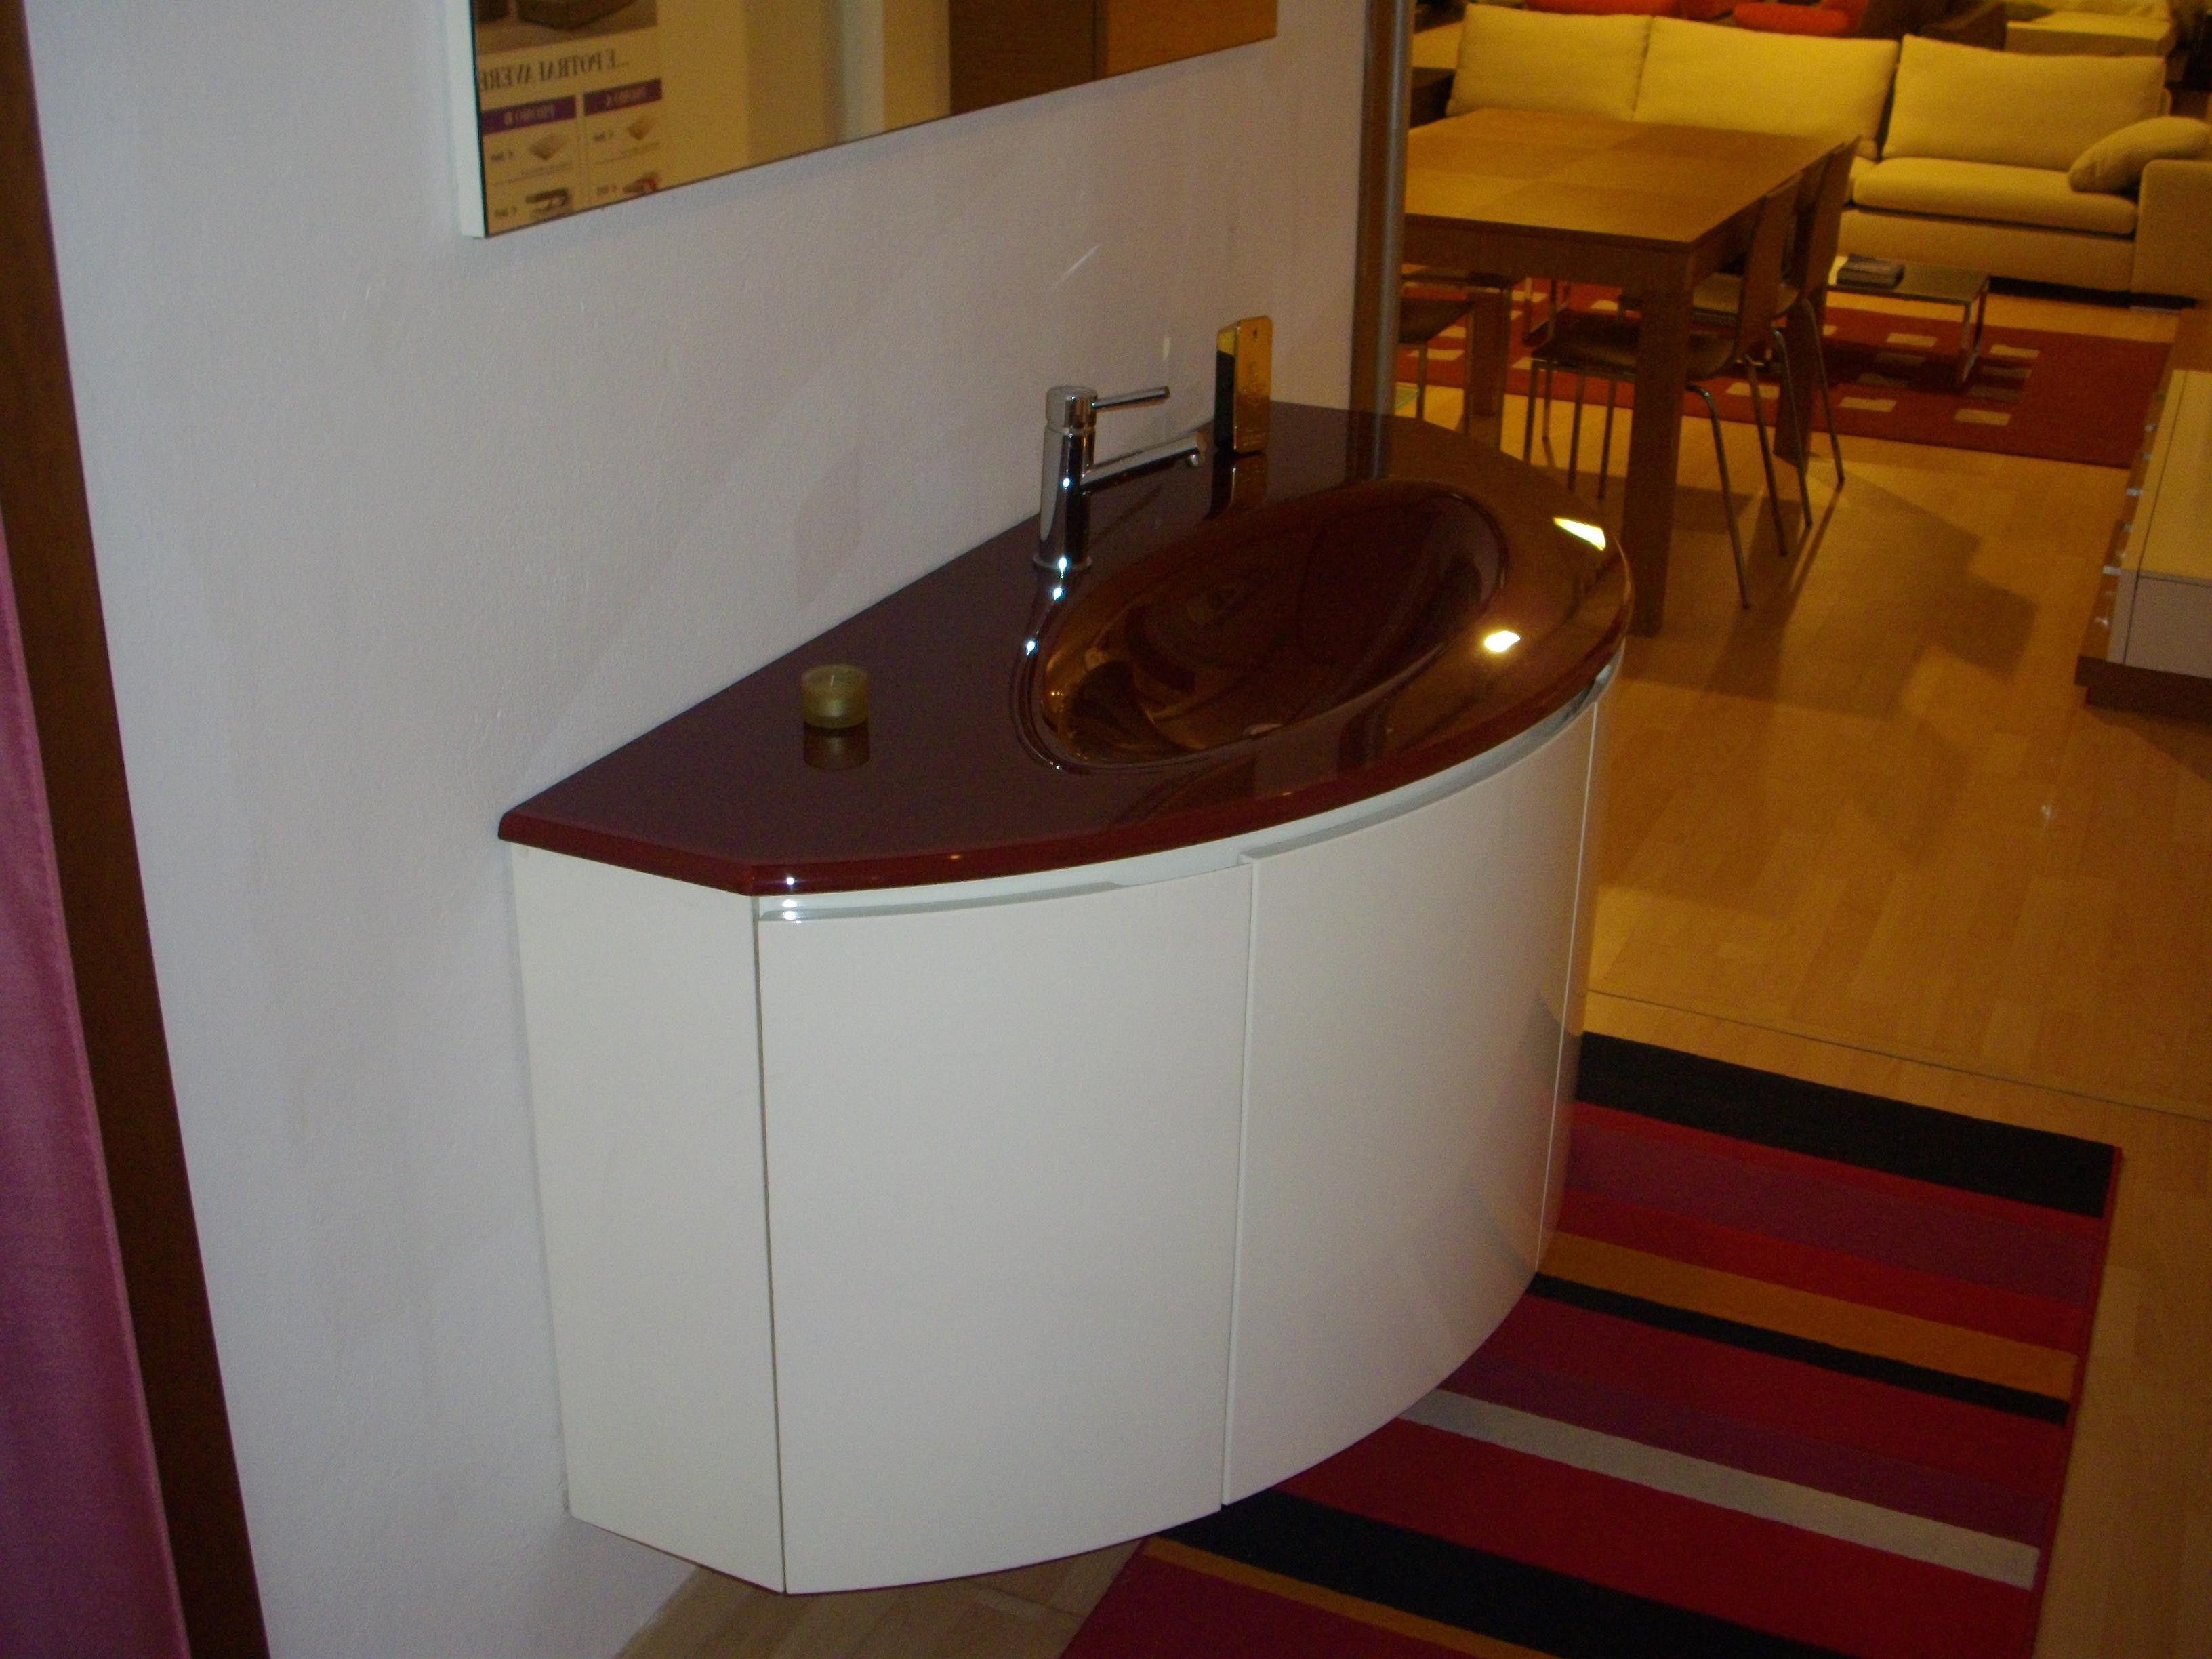 mobili da bagno in offerta : Mobile Bagno In Offerta